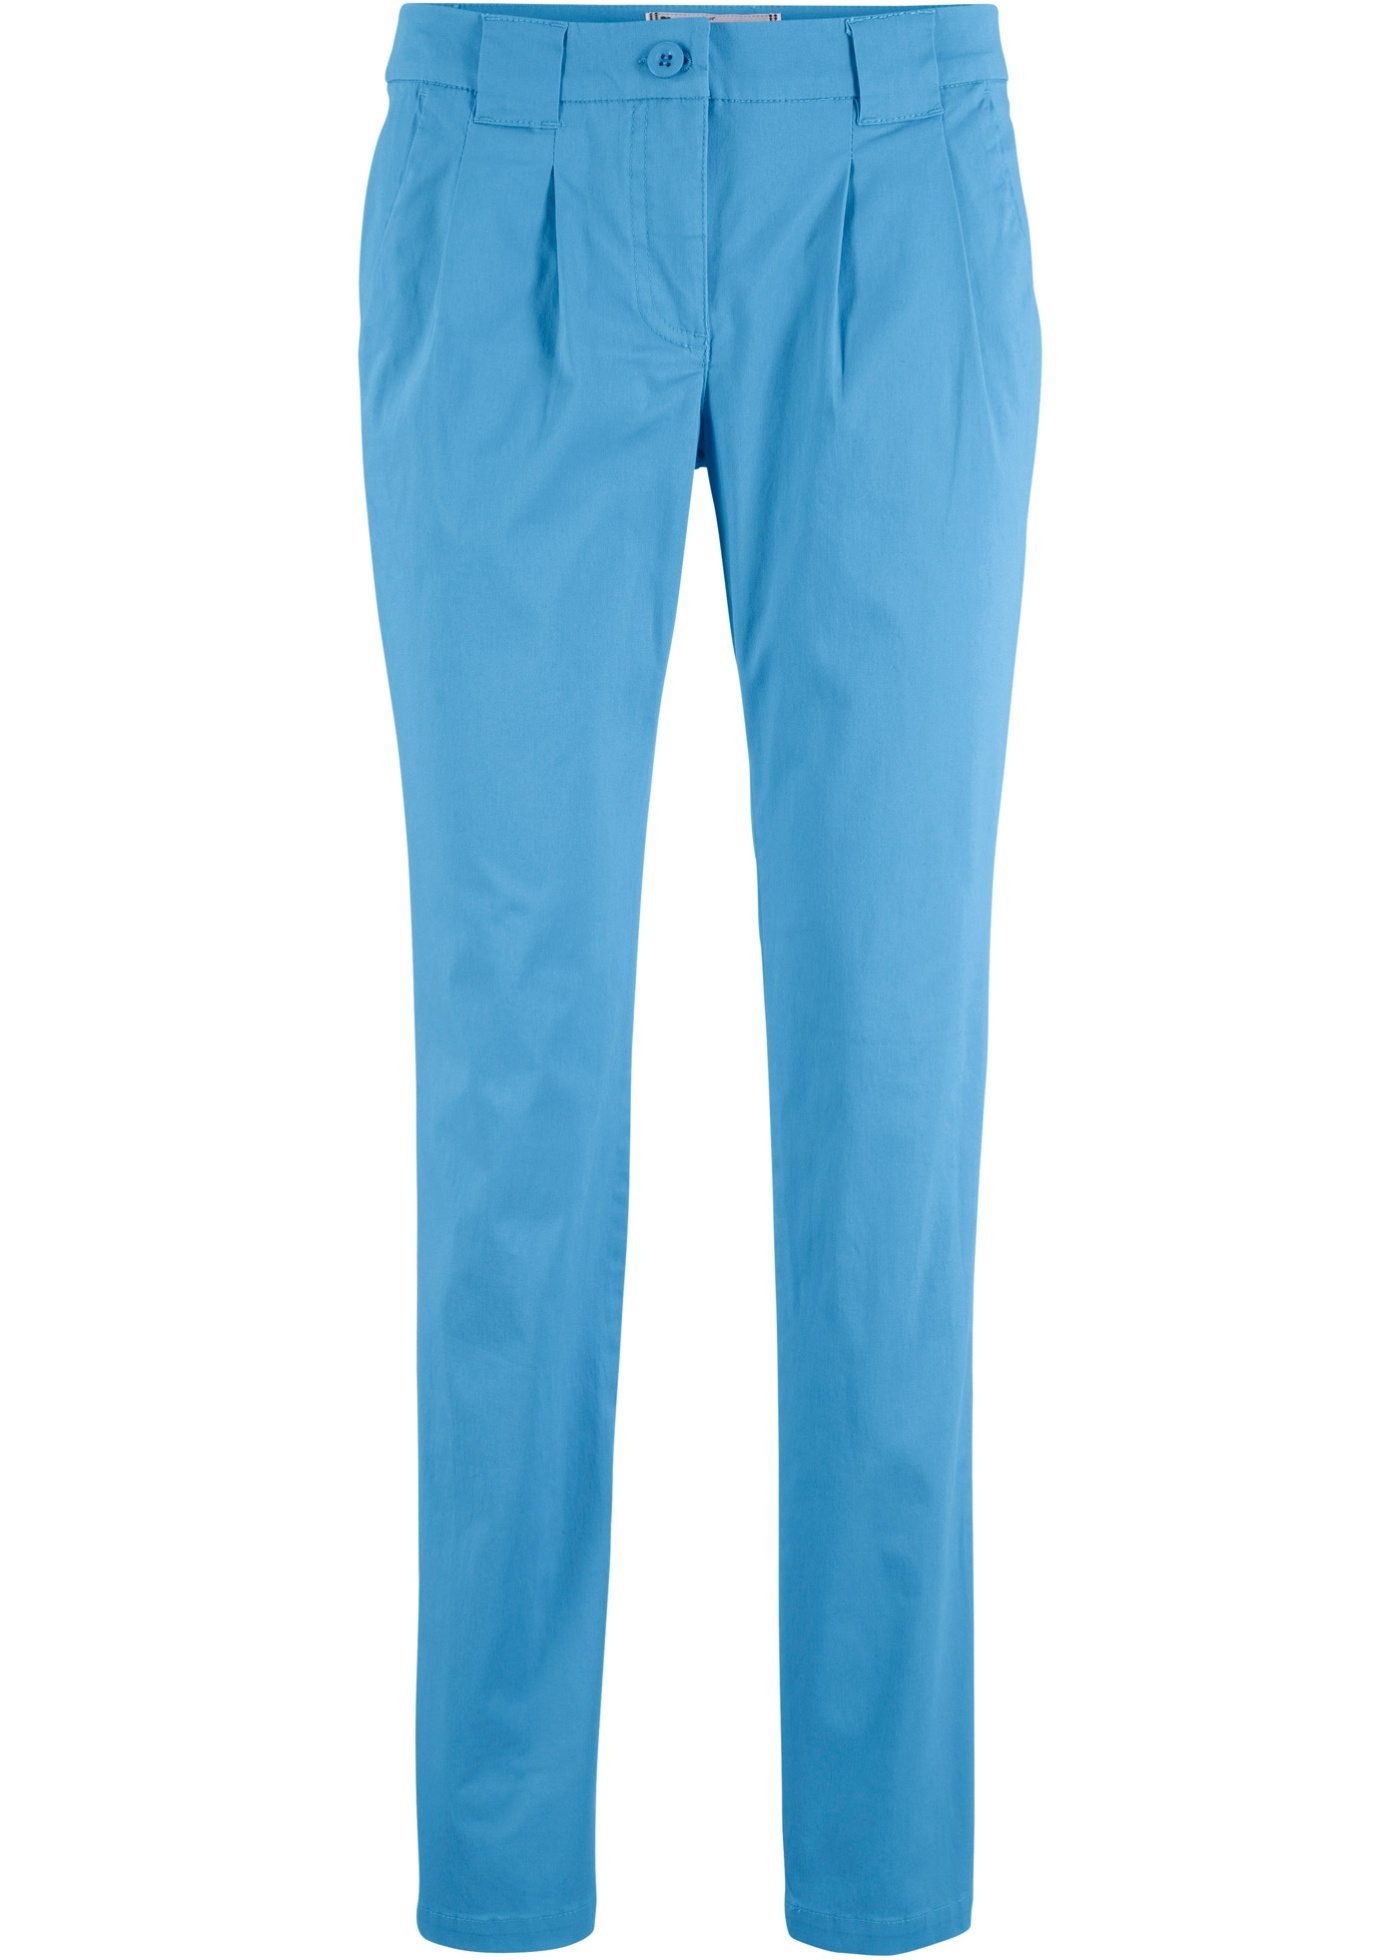 Hosen - Stretch Chinohose › bonprix › blau  - Onlineshop Bonprix